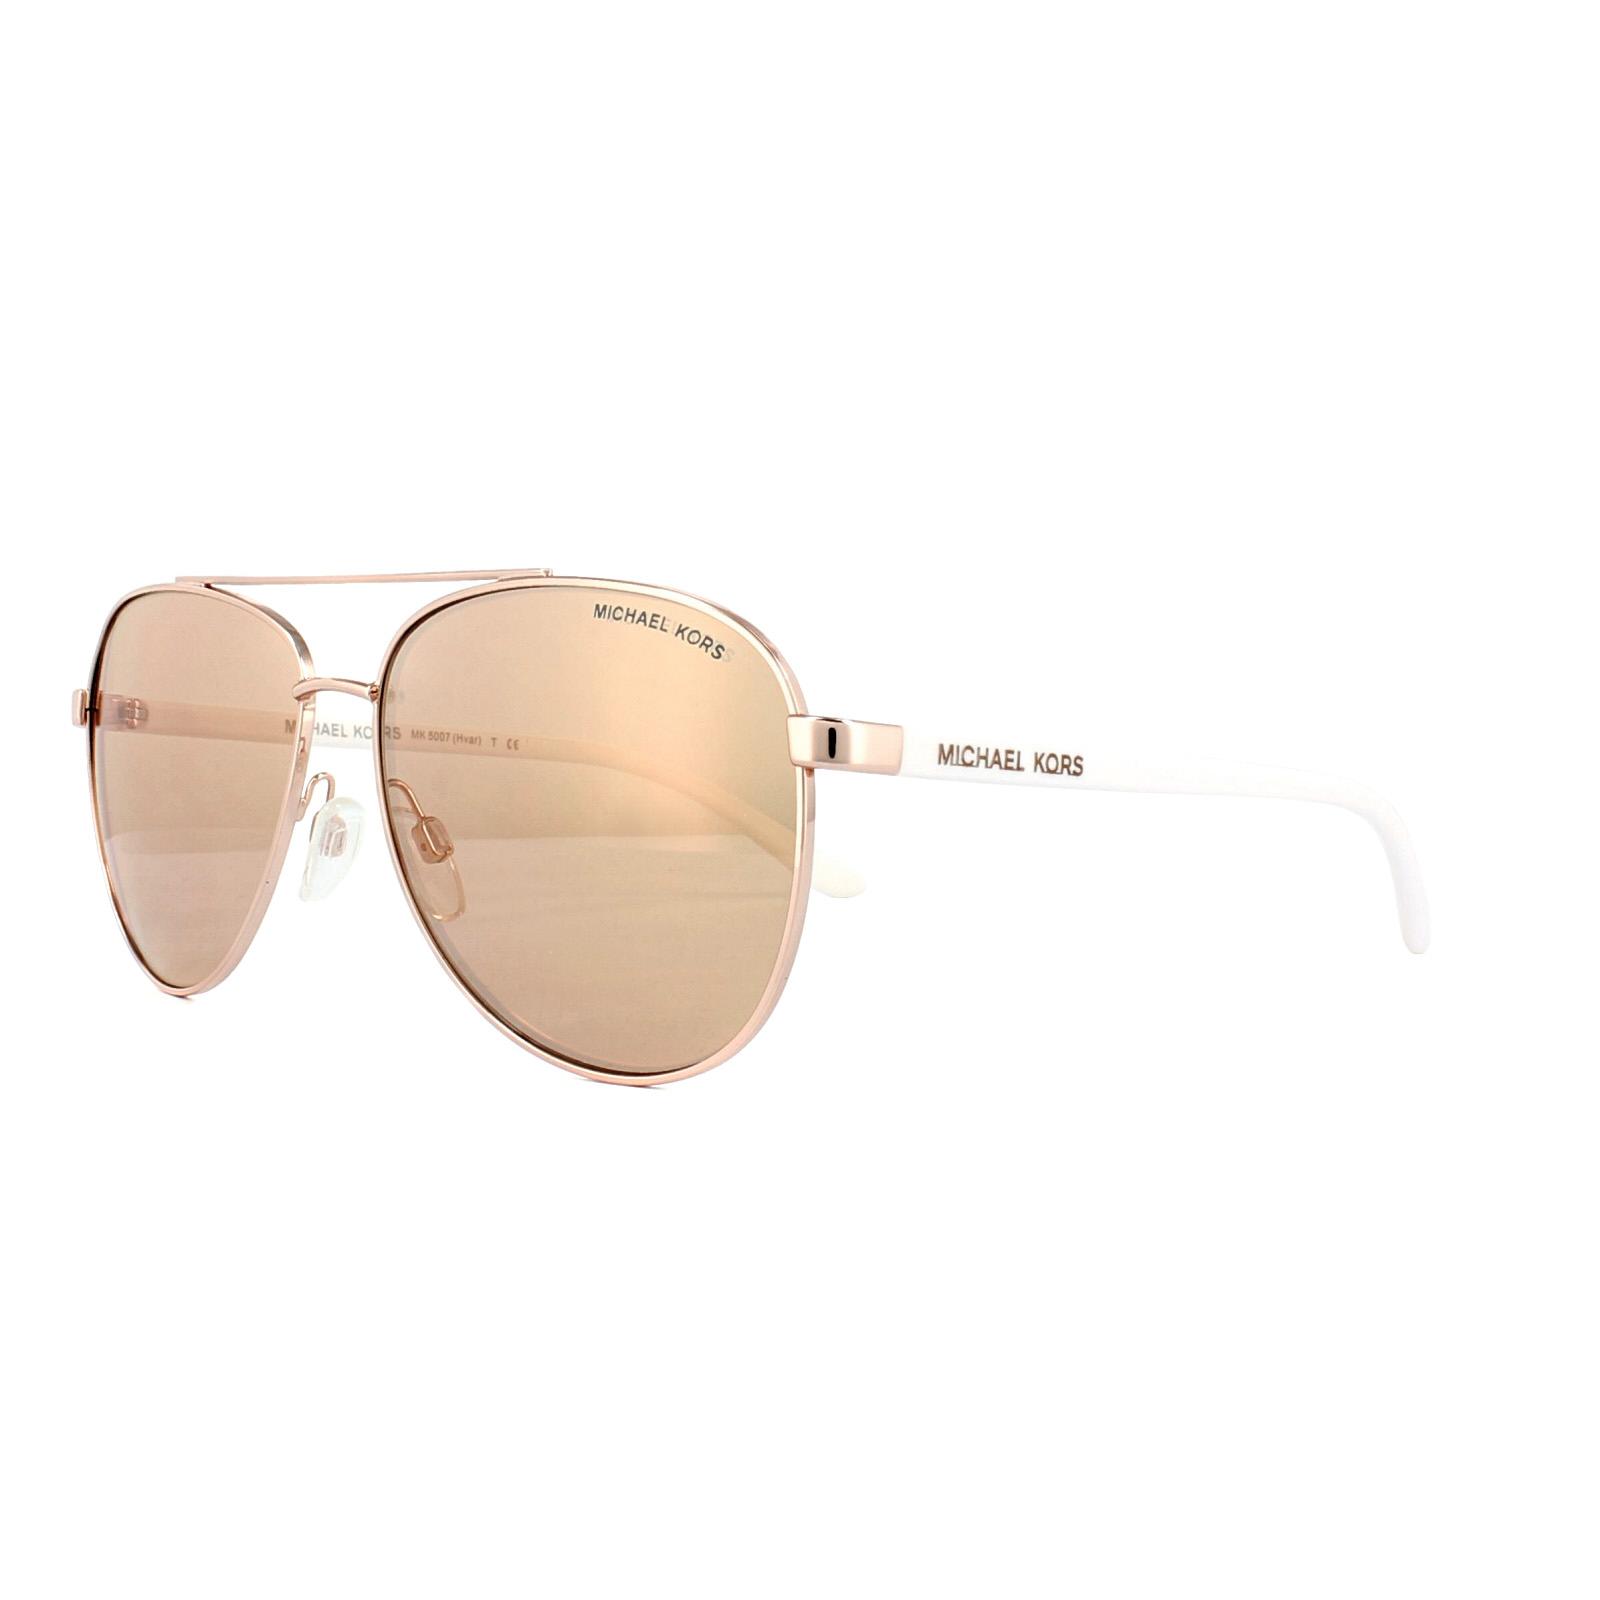 4d525a1774 Sentinel Michael Kors Sunglasses Hvar 5007 1080 R1 Rose Gold Rose Gold  Mirror